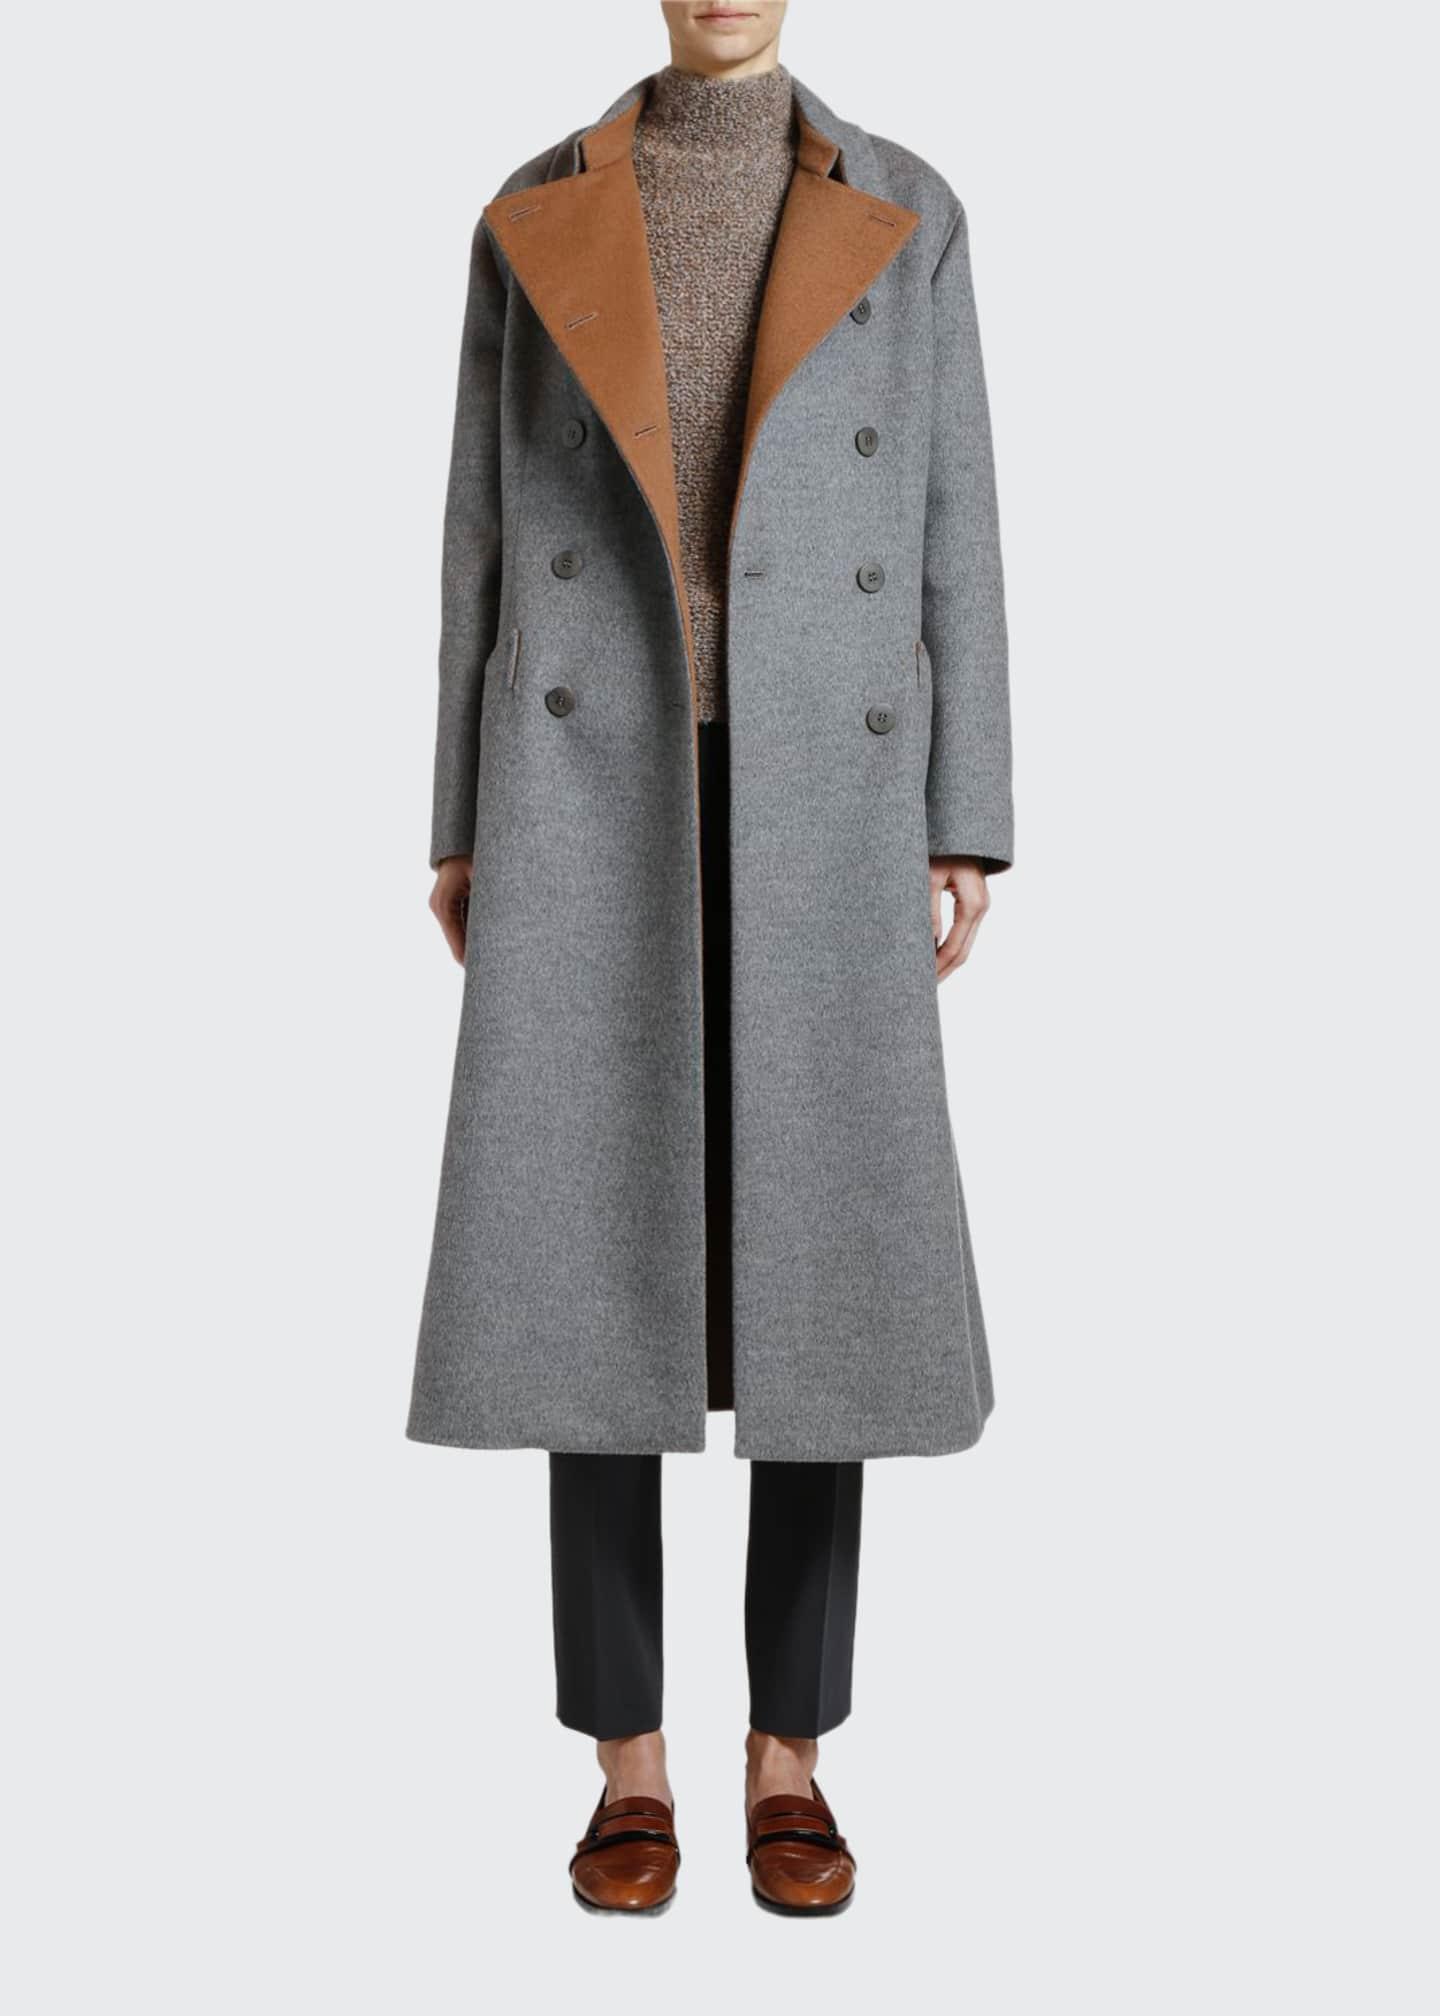 Giorgio Armani Double-Face Cashmere Coat